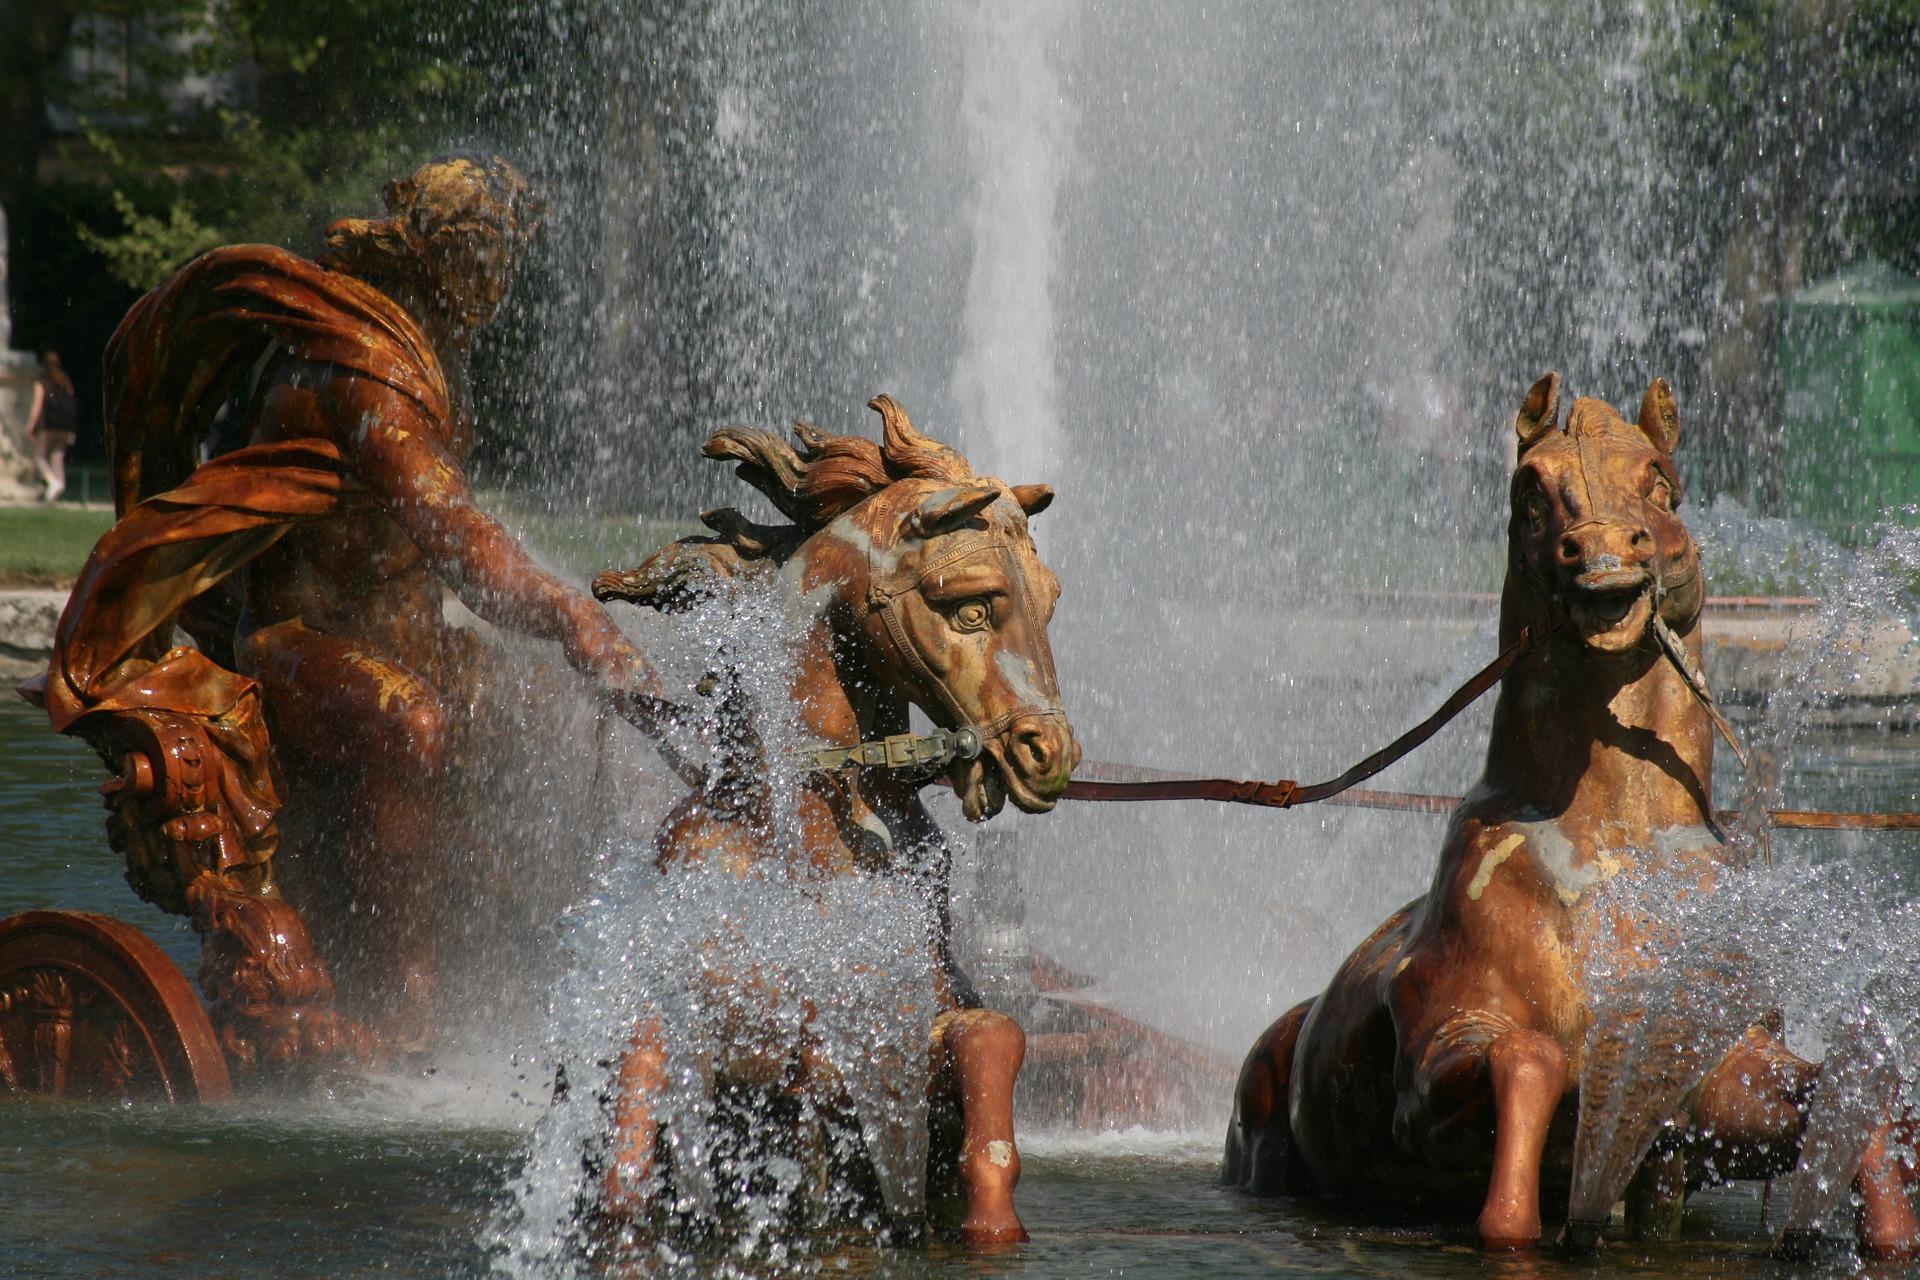 Paris - Apollo featured in the Versailles garden.